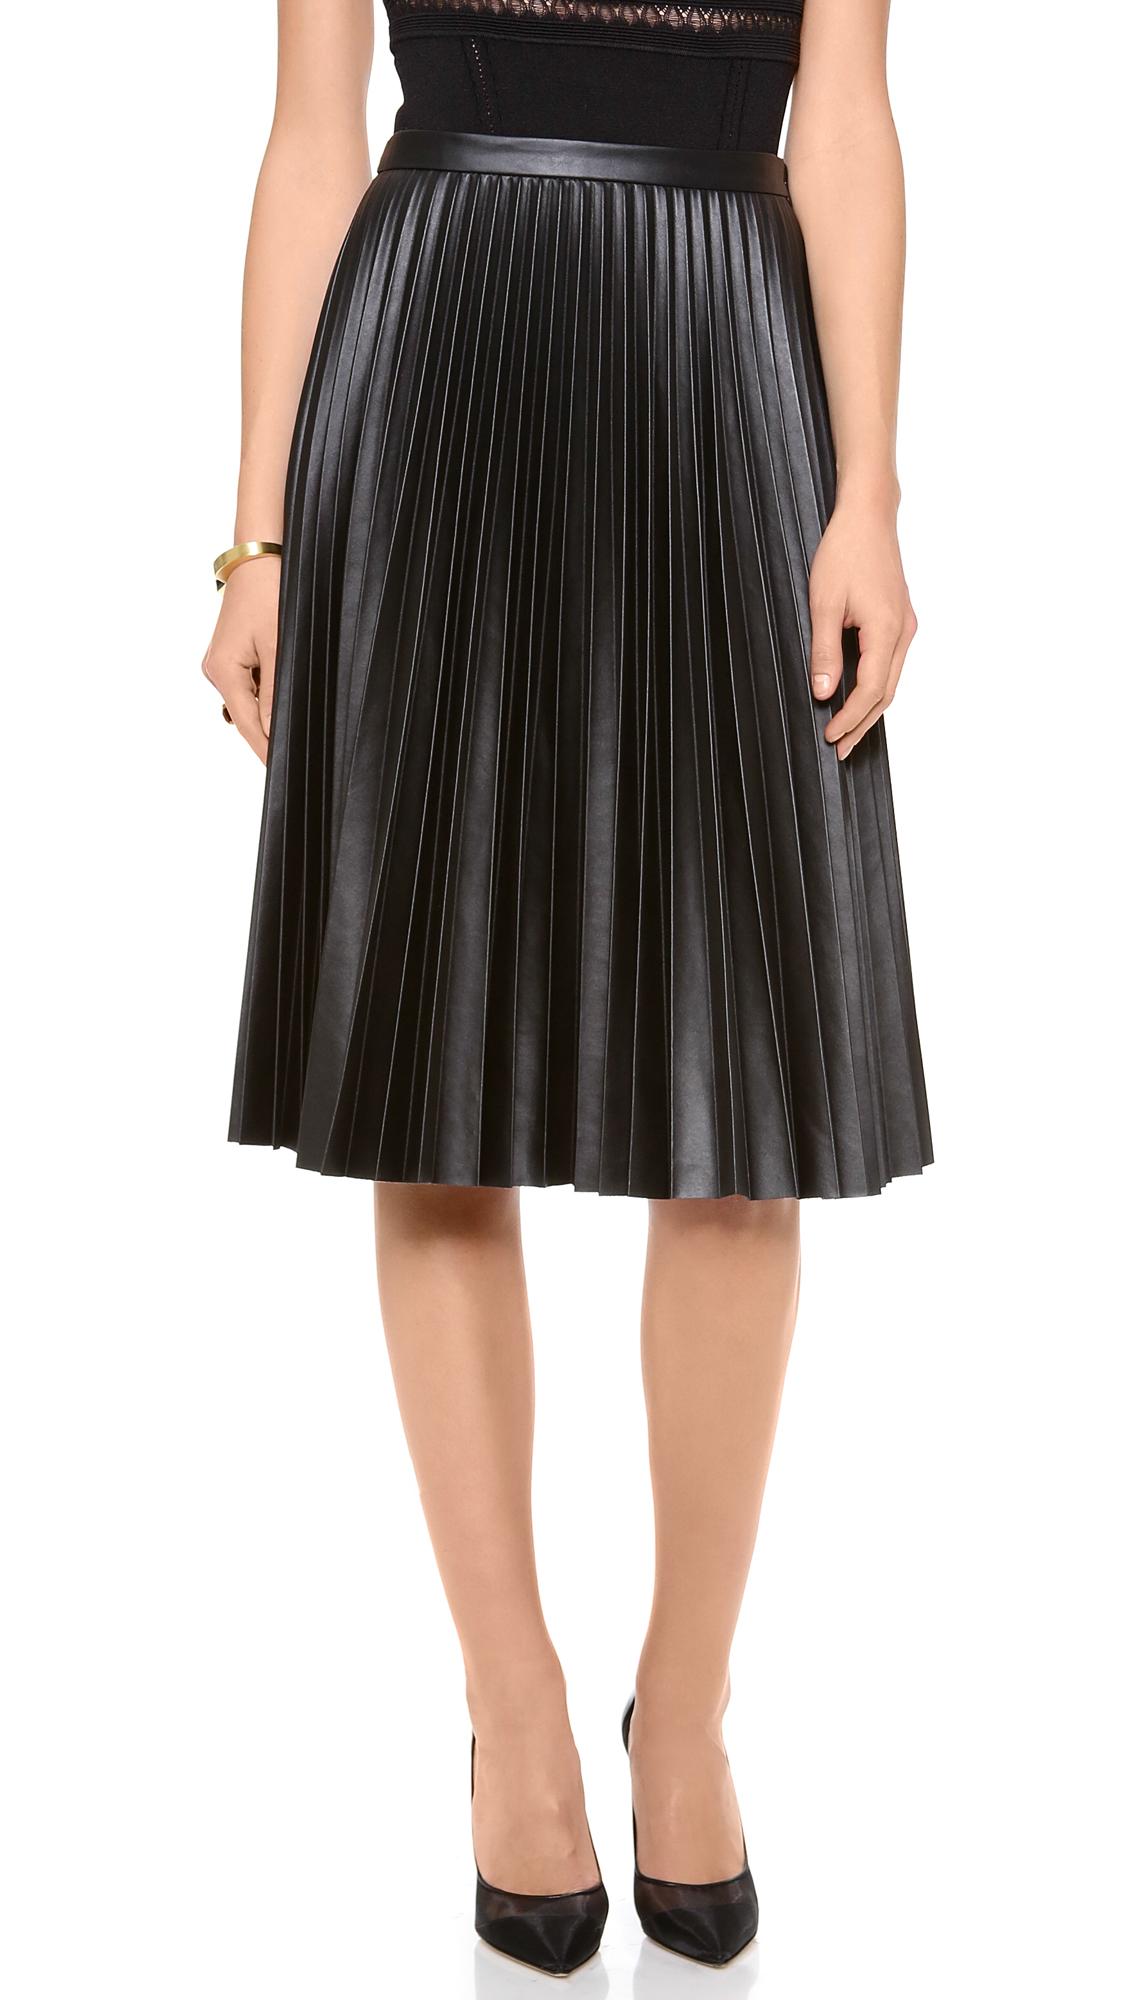 Bcbgmaxazria Pleated Skirt In Black Lyst